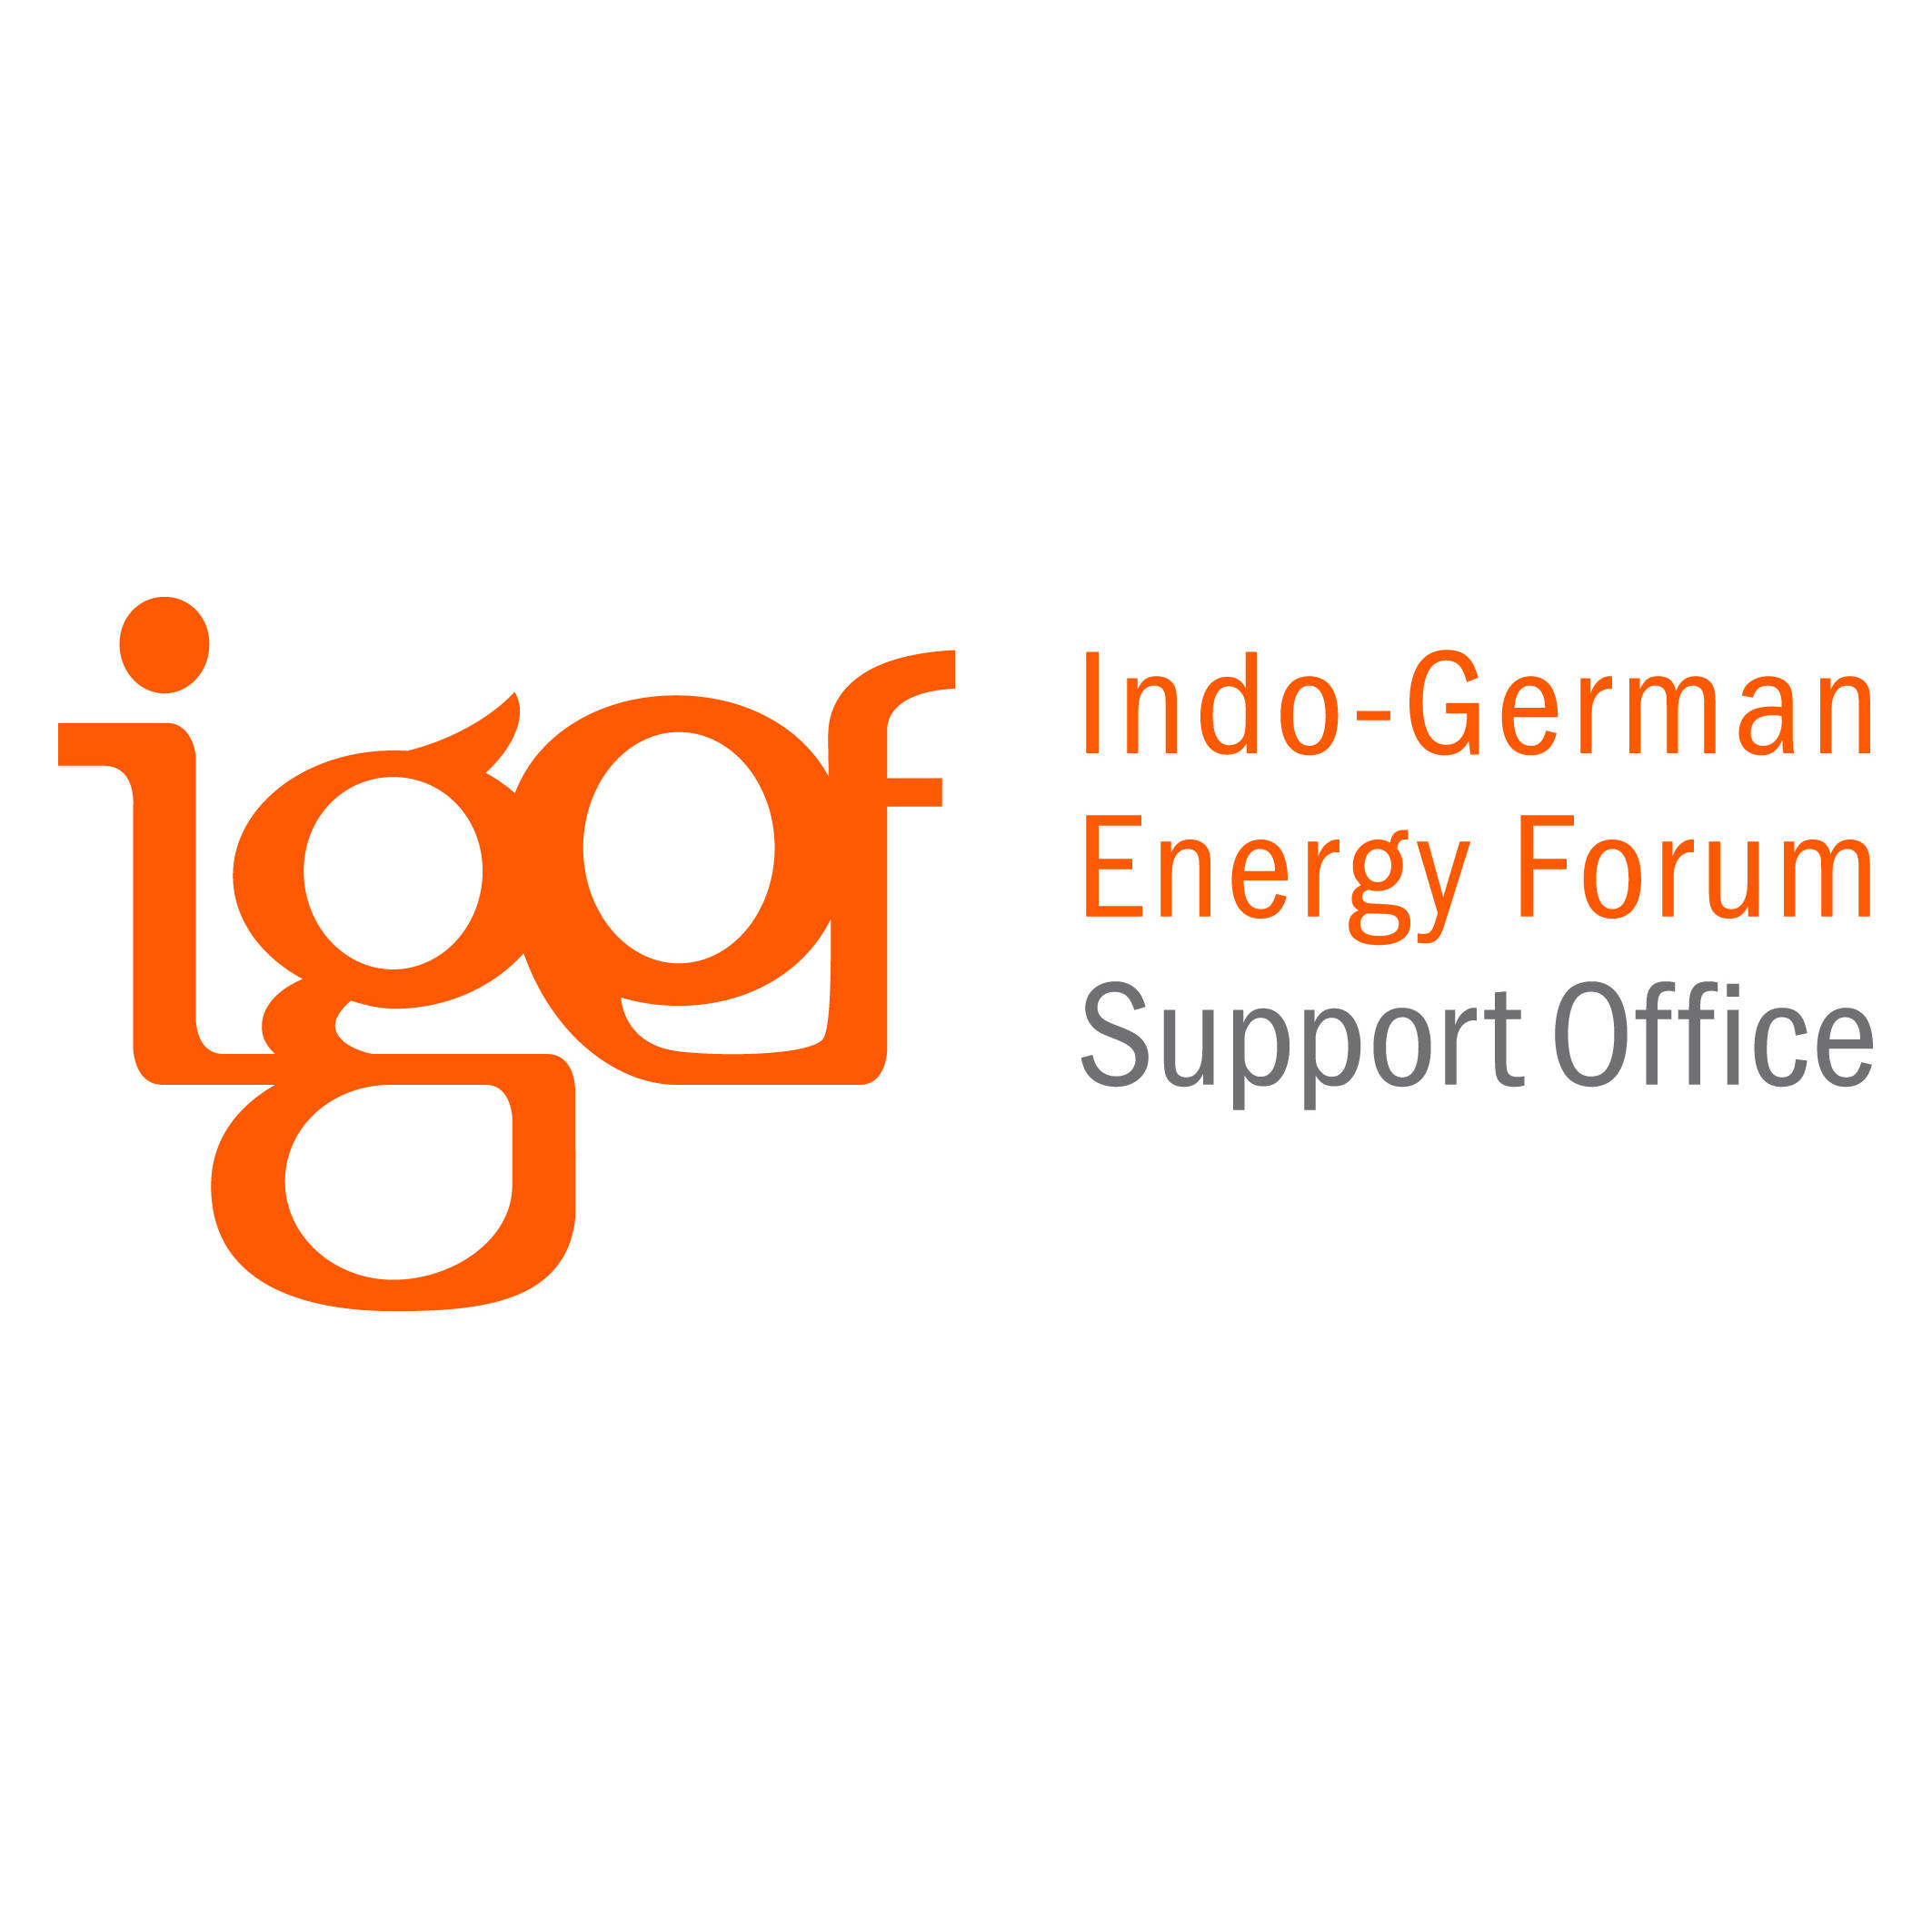 Indo-German Energy Forum